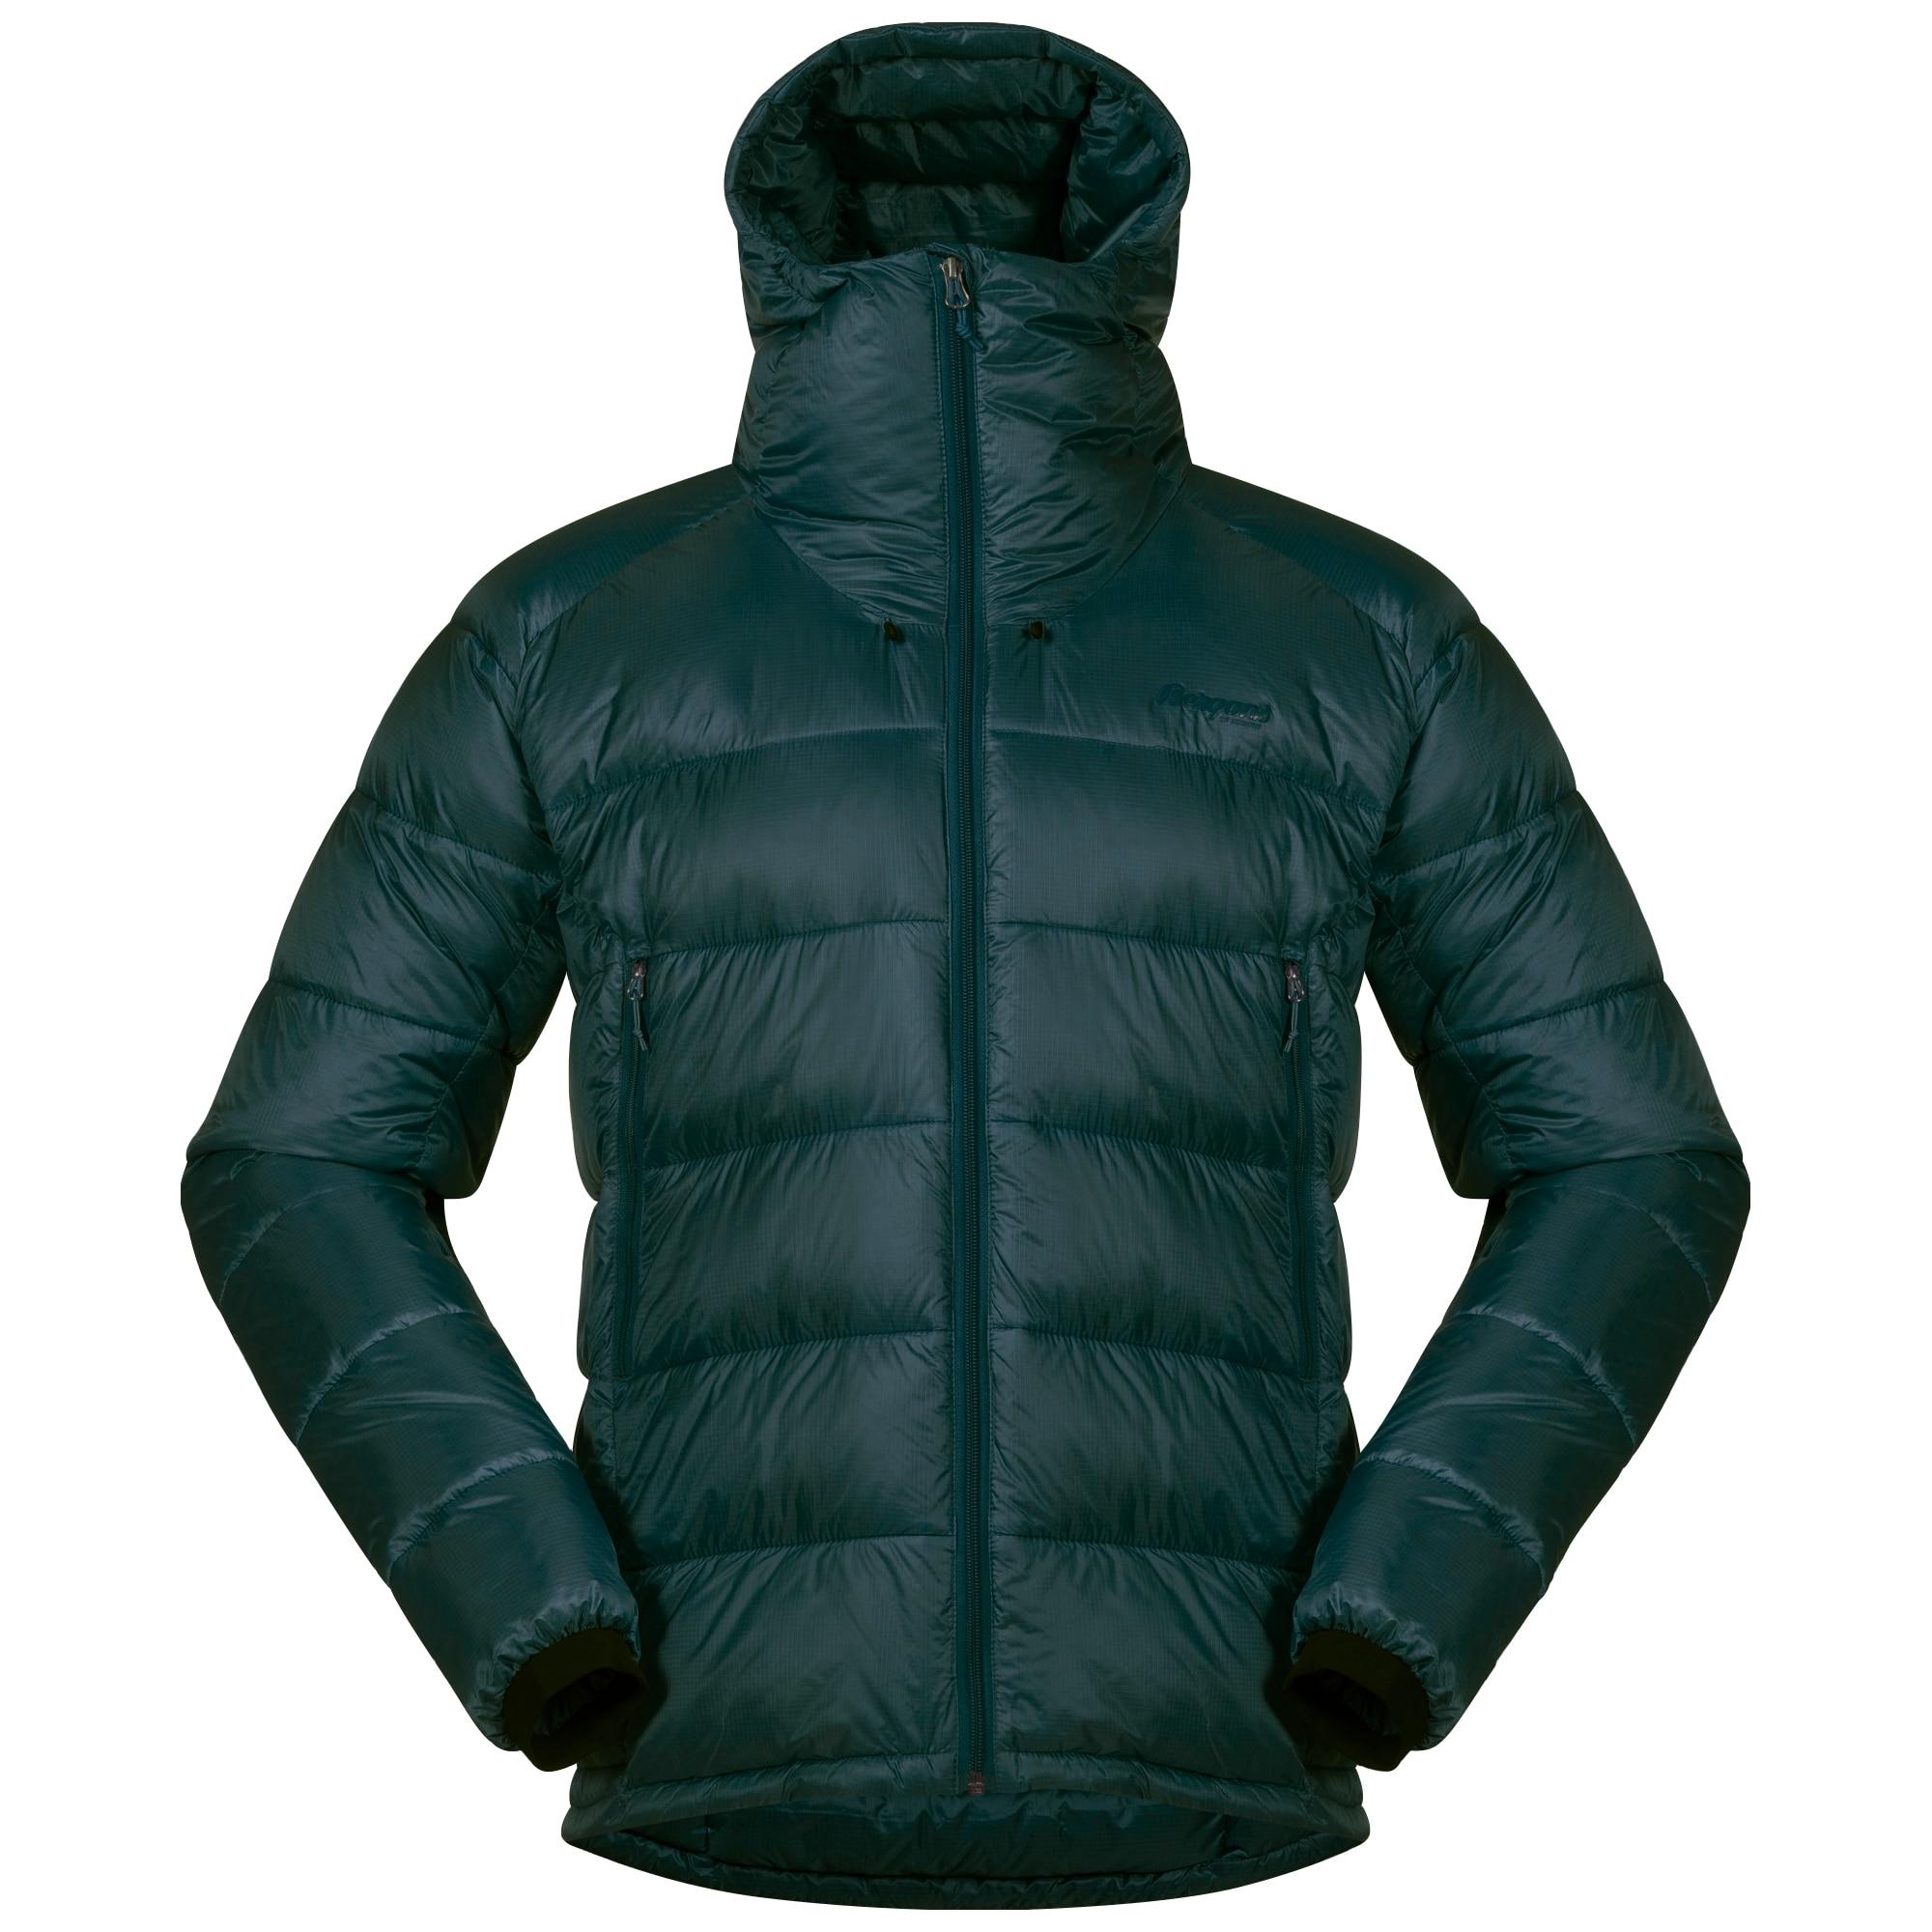 Slingsby Down Jacket